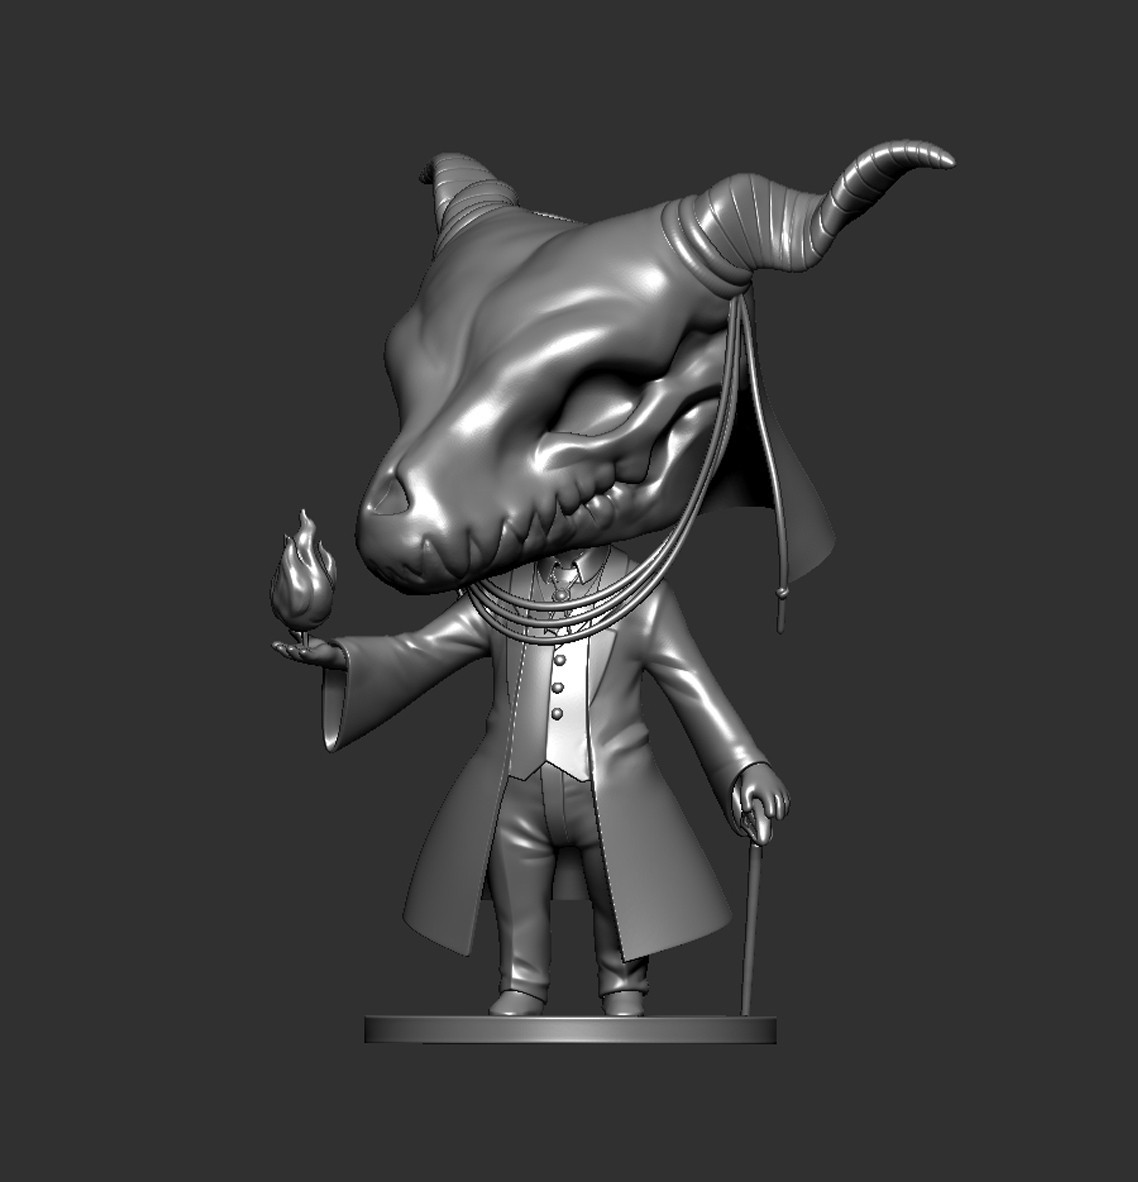 Elias06.jpg Download STL file Elias Ainsworth Chibi figurine • 3D print design, Kownus